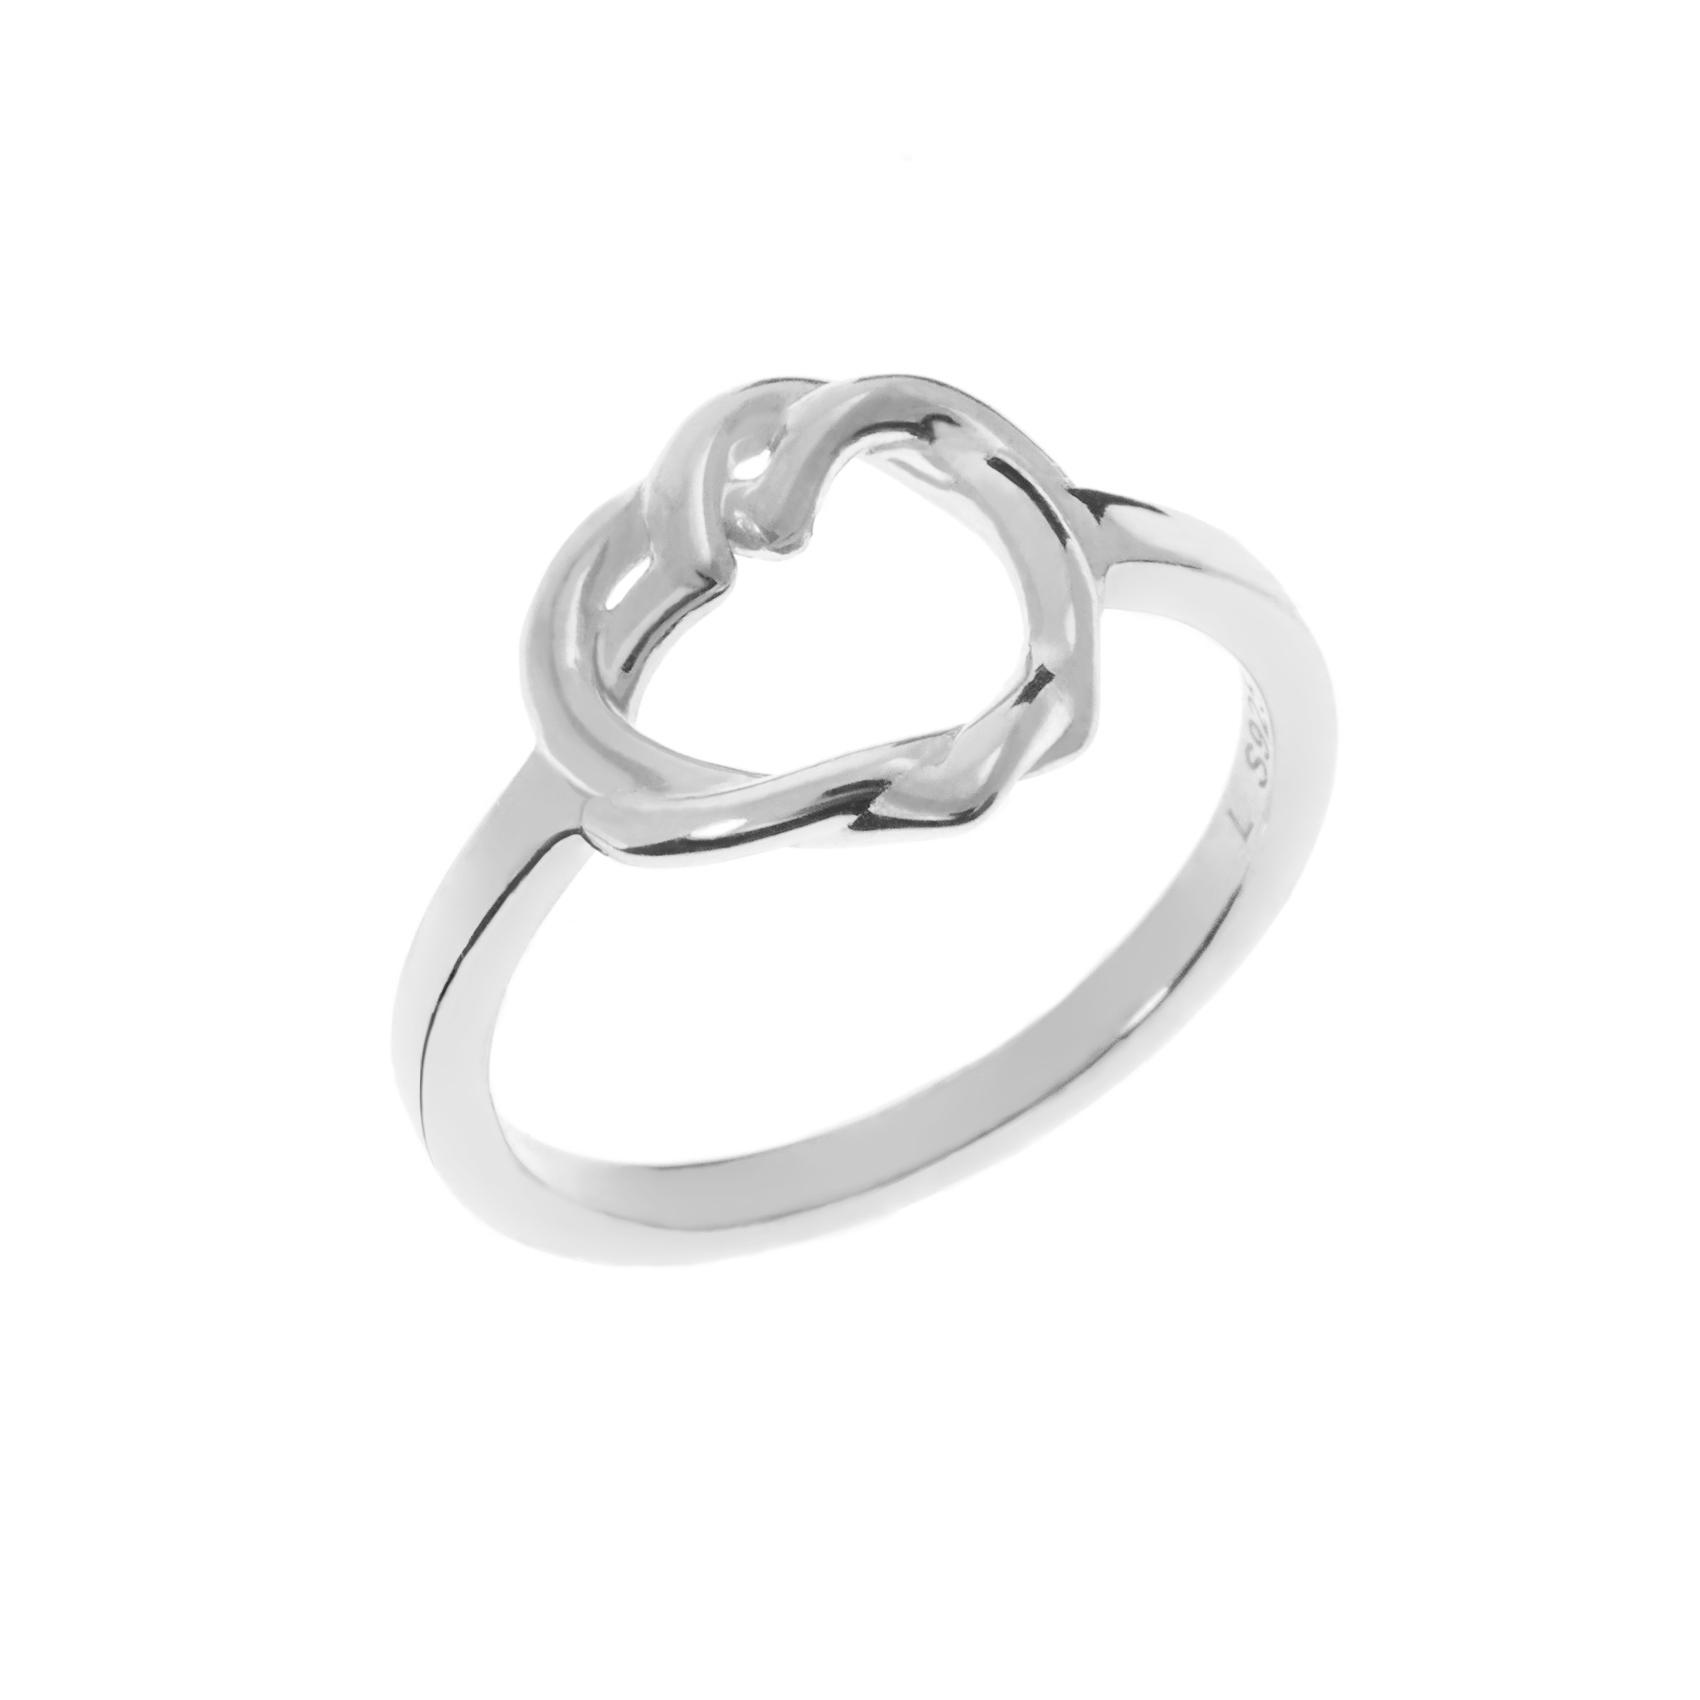 LINKS OF LONDON – Ασημένιο δαχτυλίδι Kindred Soul